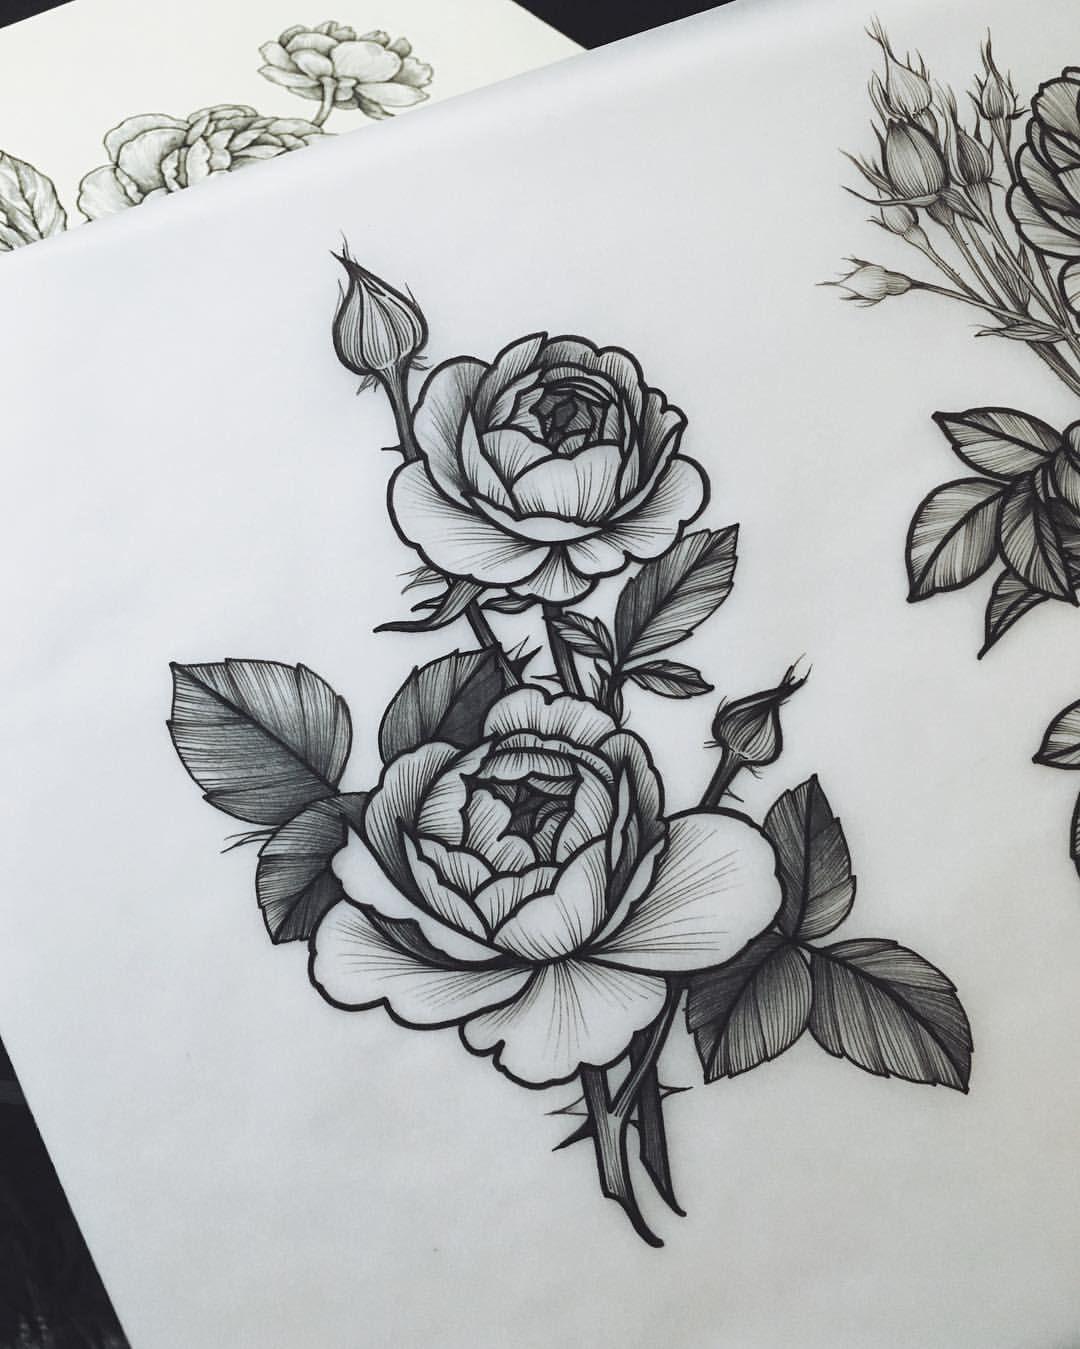 One More Night Drawing Sashamasiuk Sashatattooingsketch Sketch Flowers Sashatattooing Rose At Berlin Mit Tattoos Tattoo Sketches Body Art Tattoos